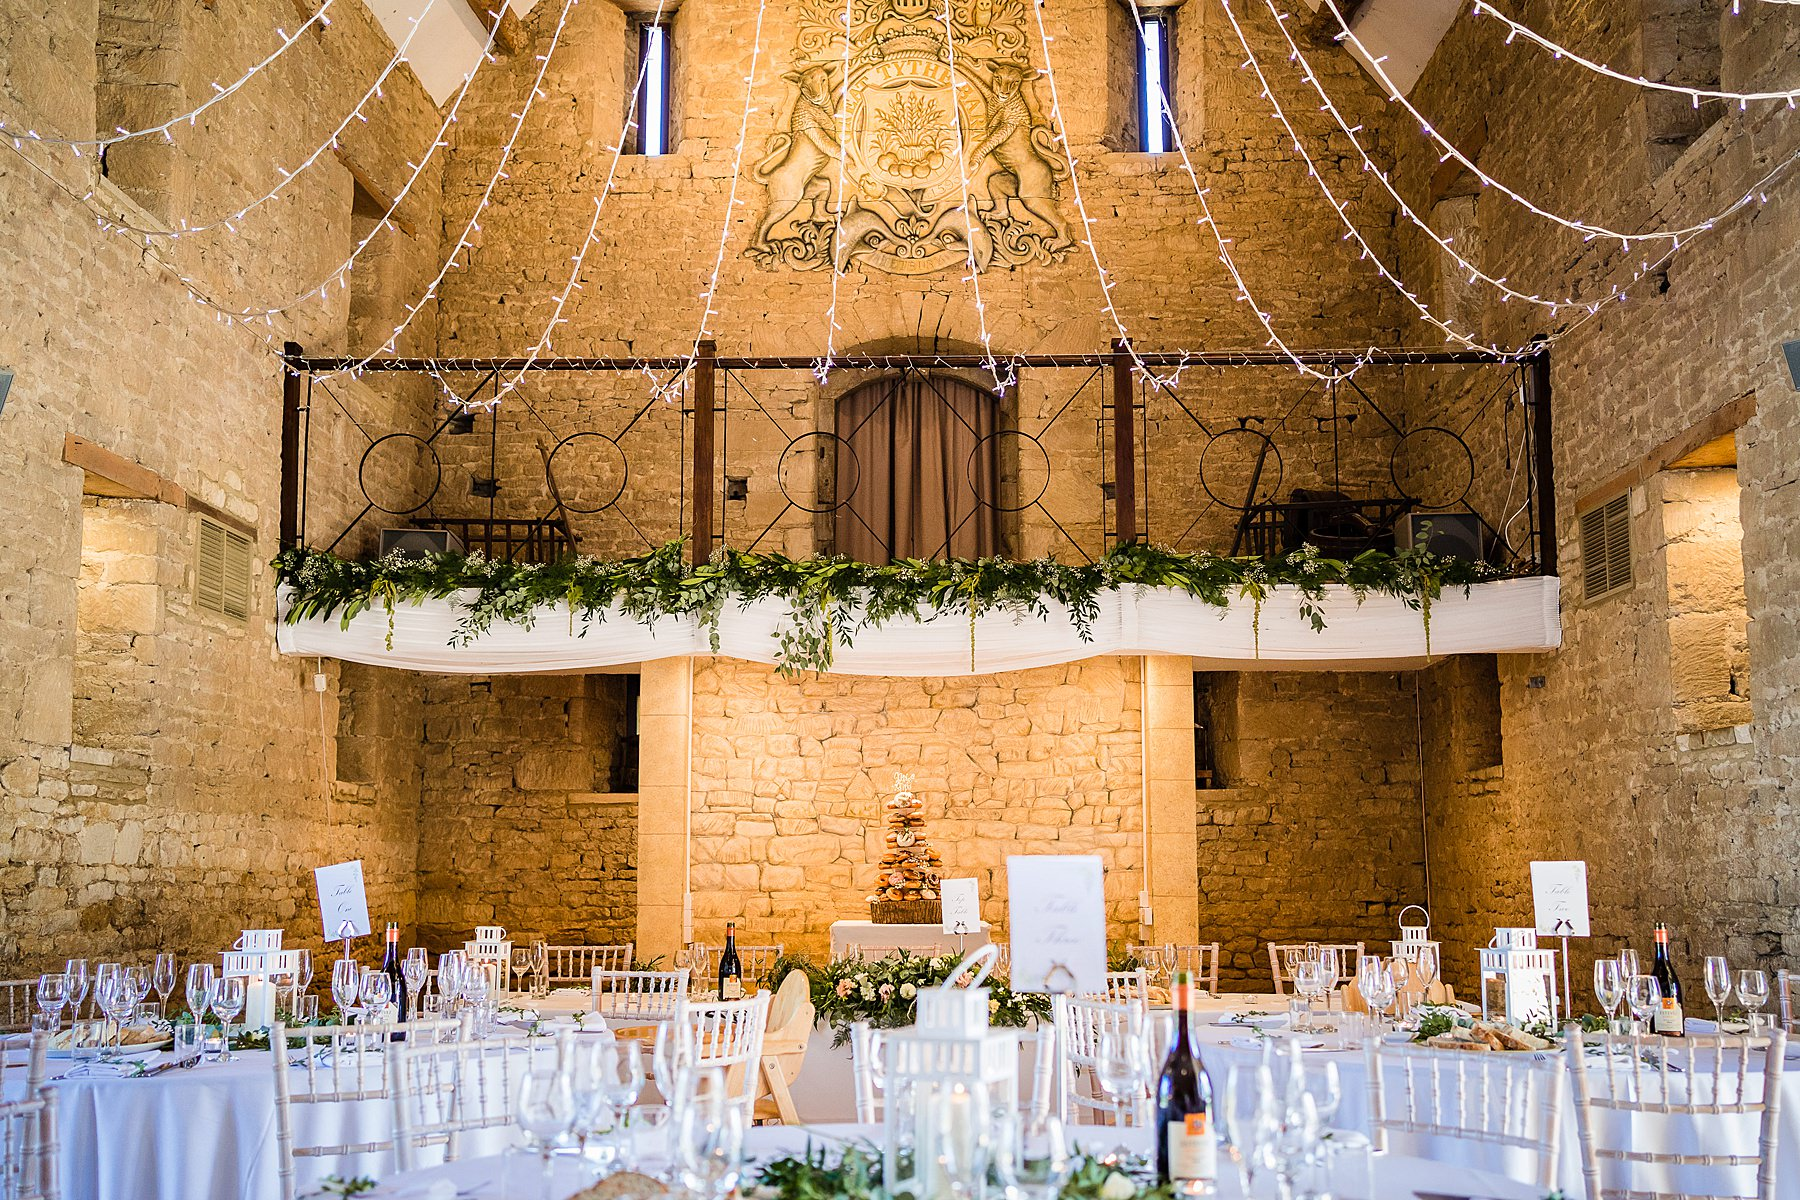 great tythe barn wedding breakfast room